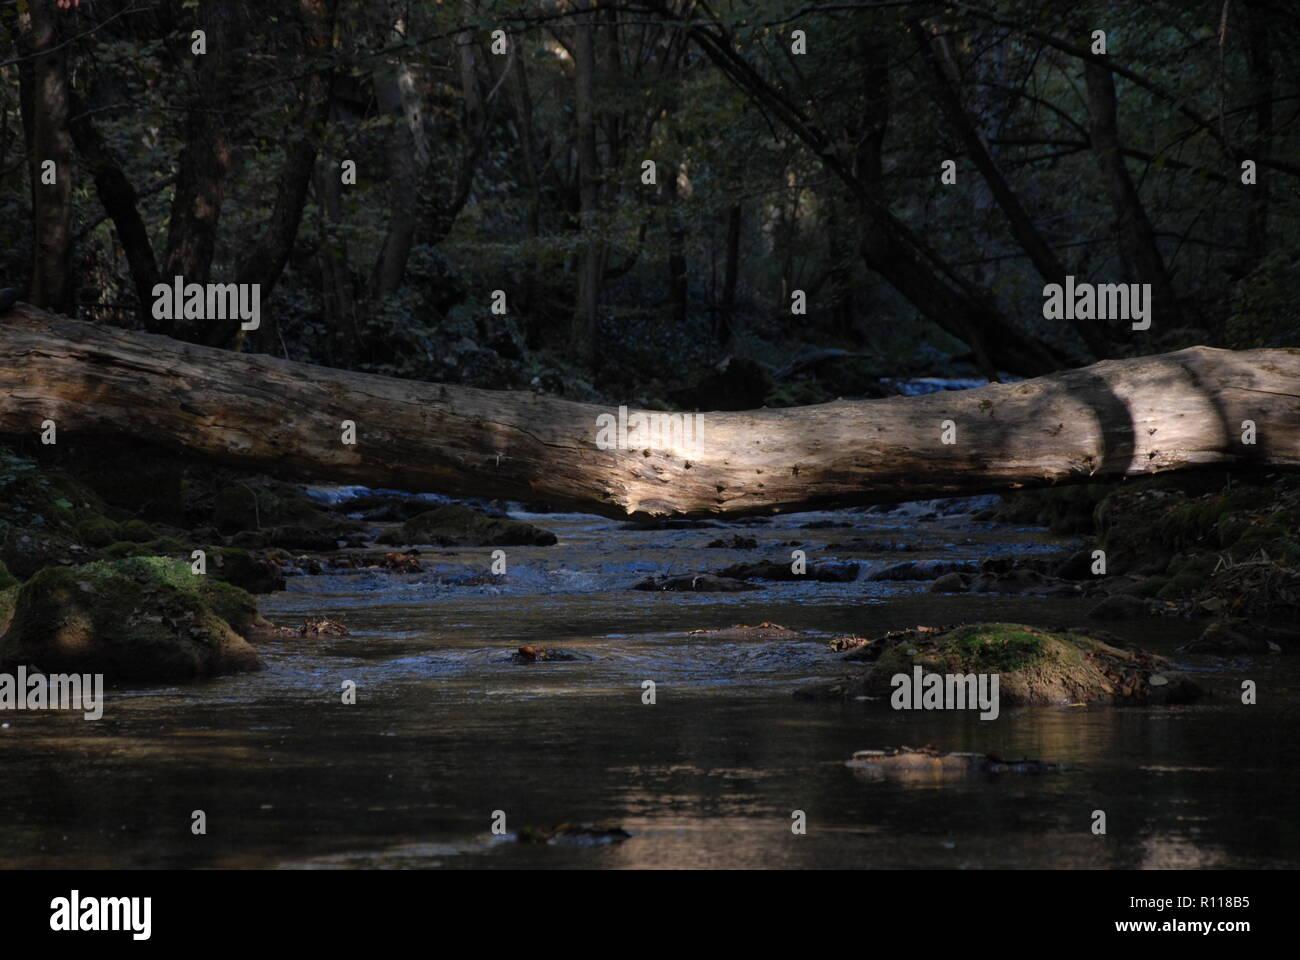 Tree above river.Romania.Nature.National Park. Nera. Adventure. Travel. Fishing. Sport. Animal - Stock Image